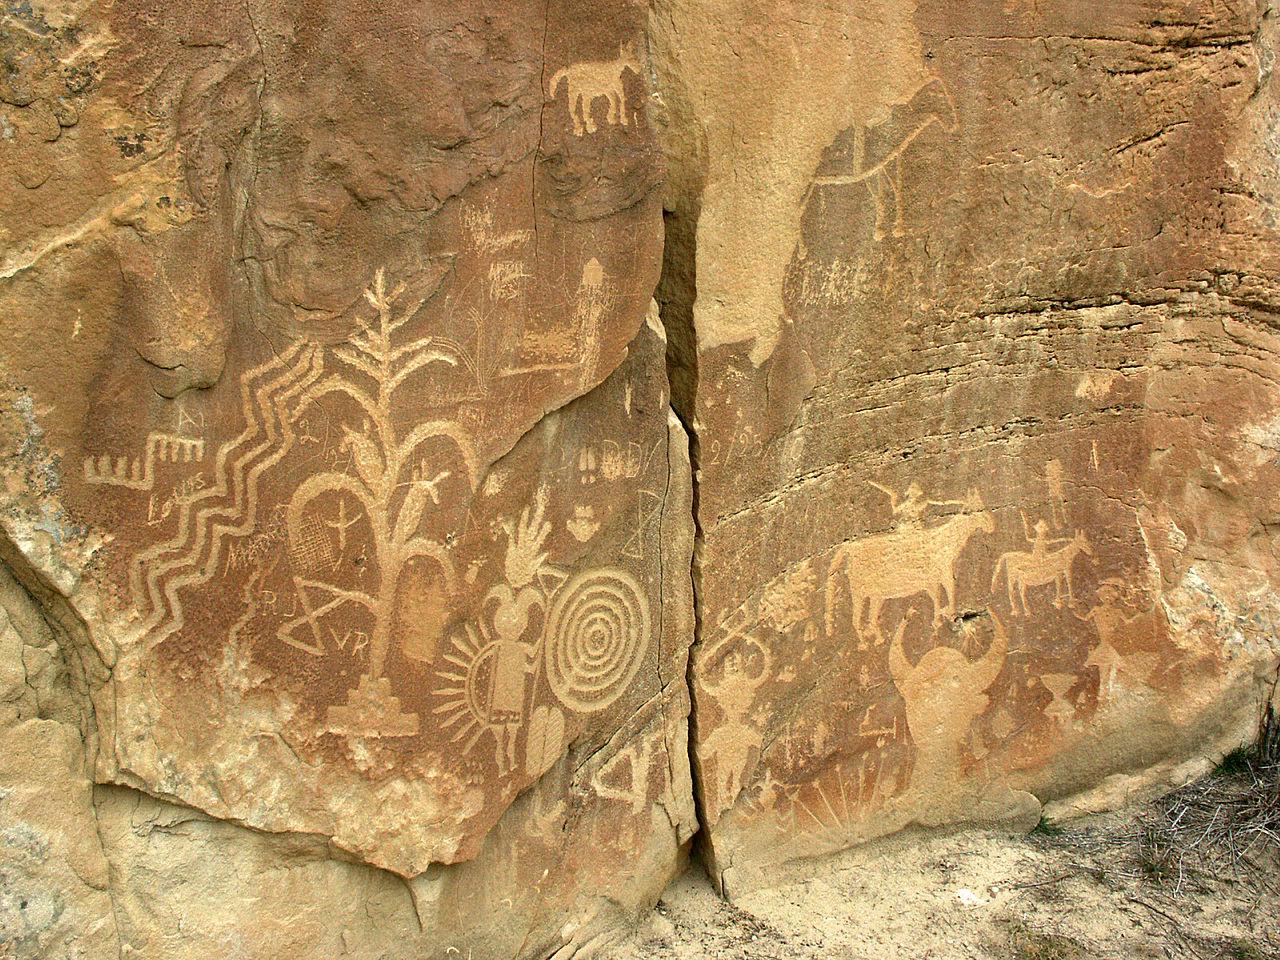 1280px-Crow_Canyon_petroglyphs навахо.jpg